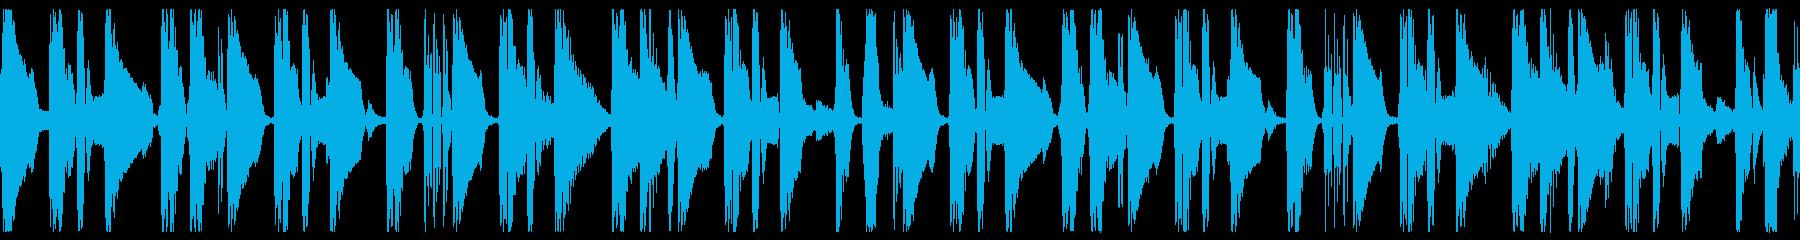 Jazz風なシンプルBGMループですの再生済みの波形